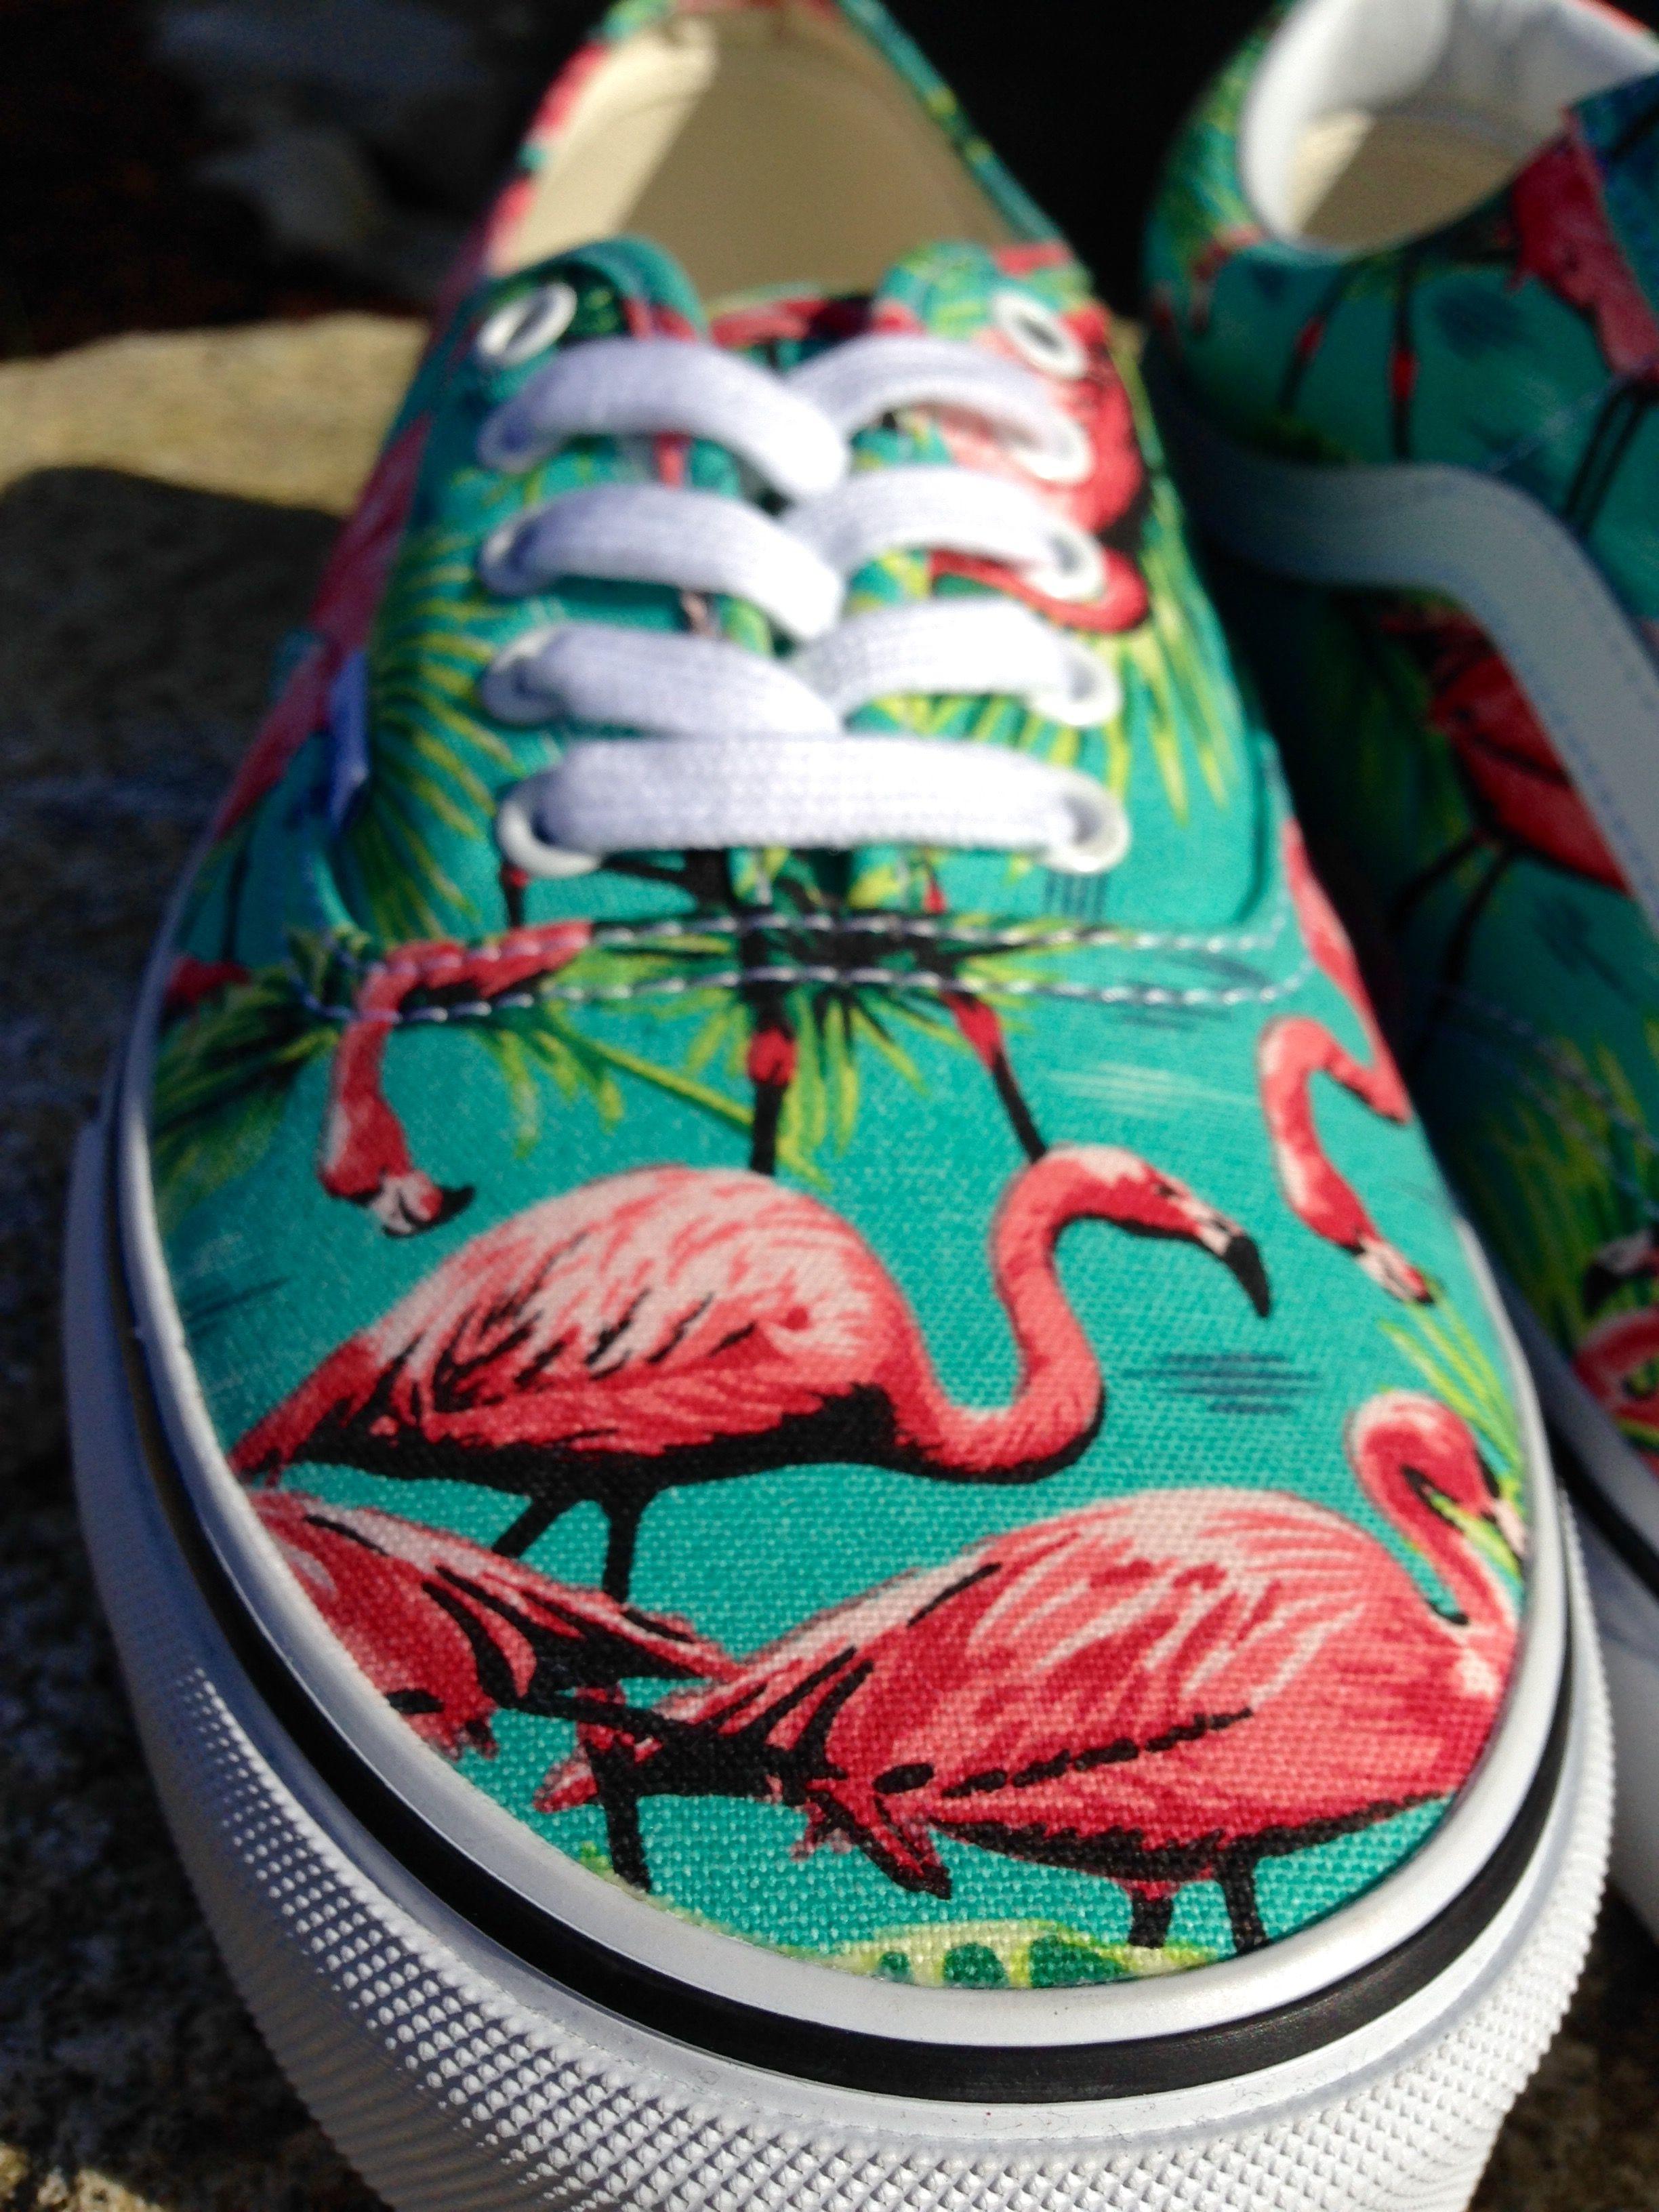 ada2fe7af40 Vans Authentic Van Doren Flamingo Skate Shoes